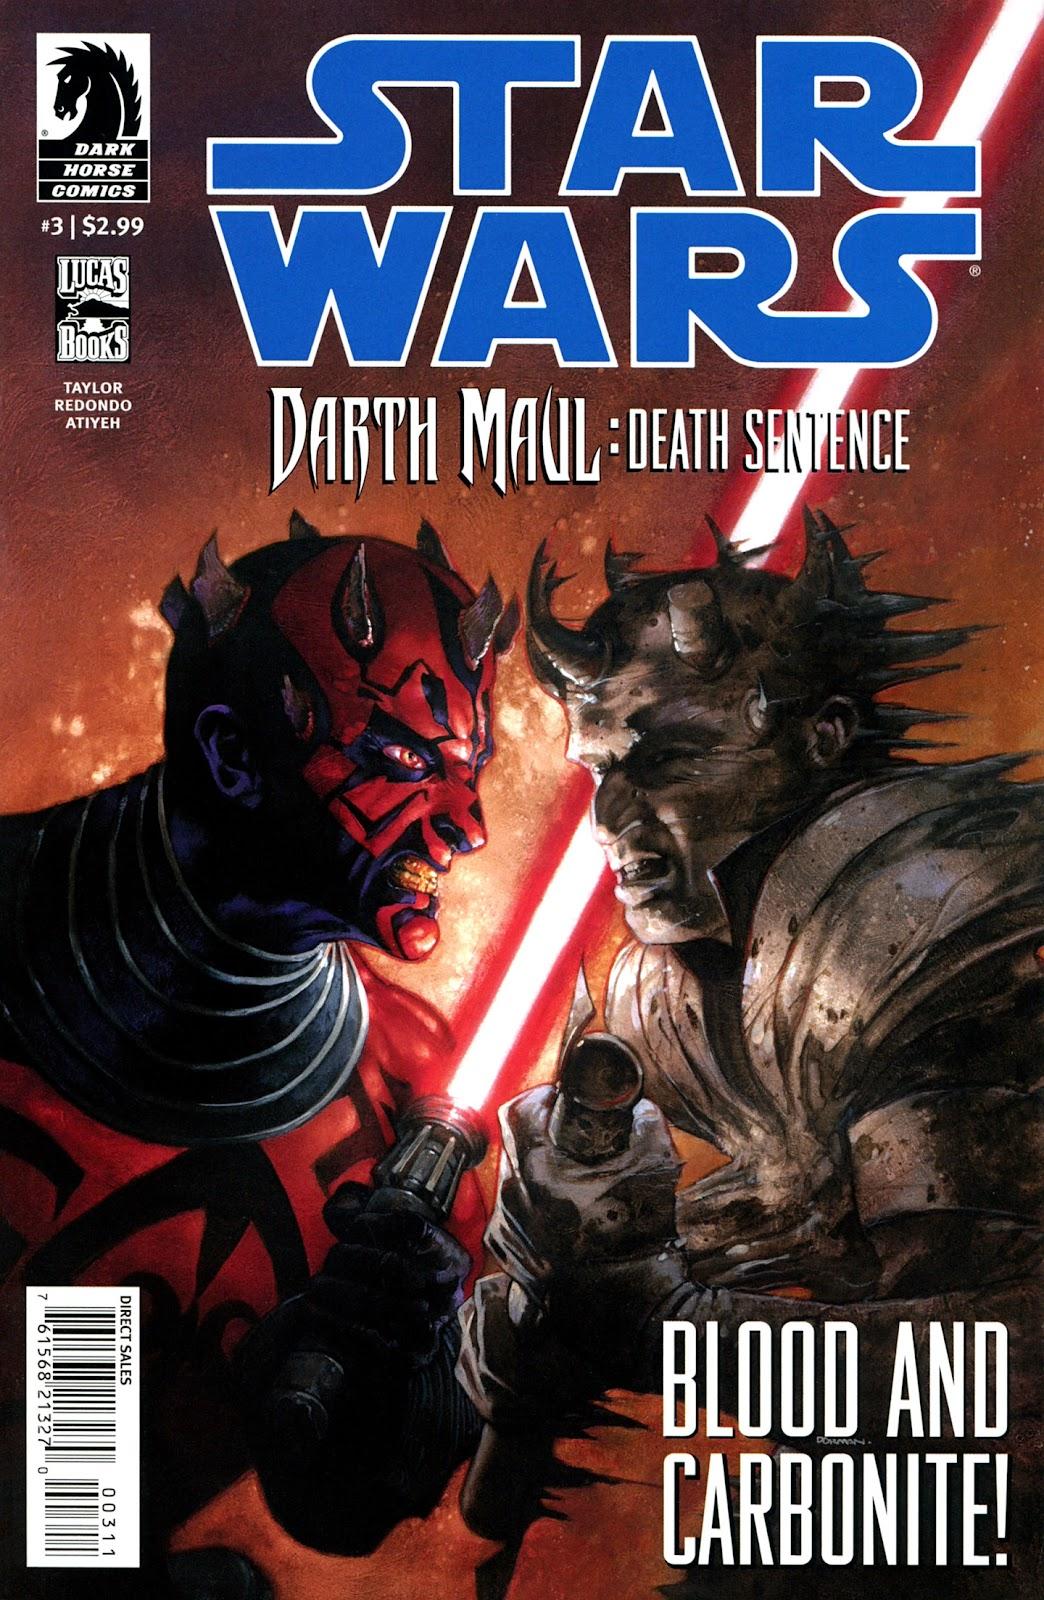 Star Wars: Darth Maul - Death Sentence 3 Page 1